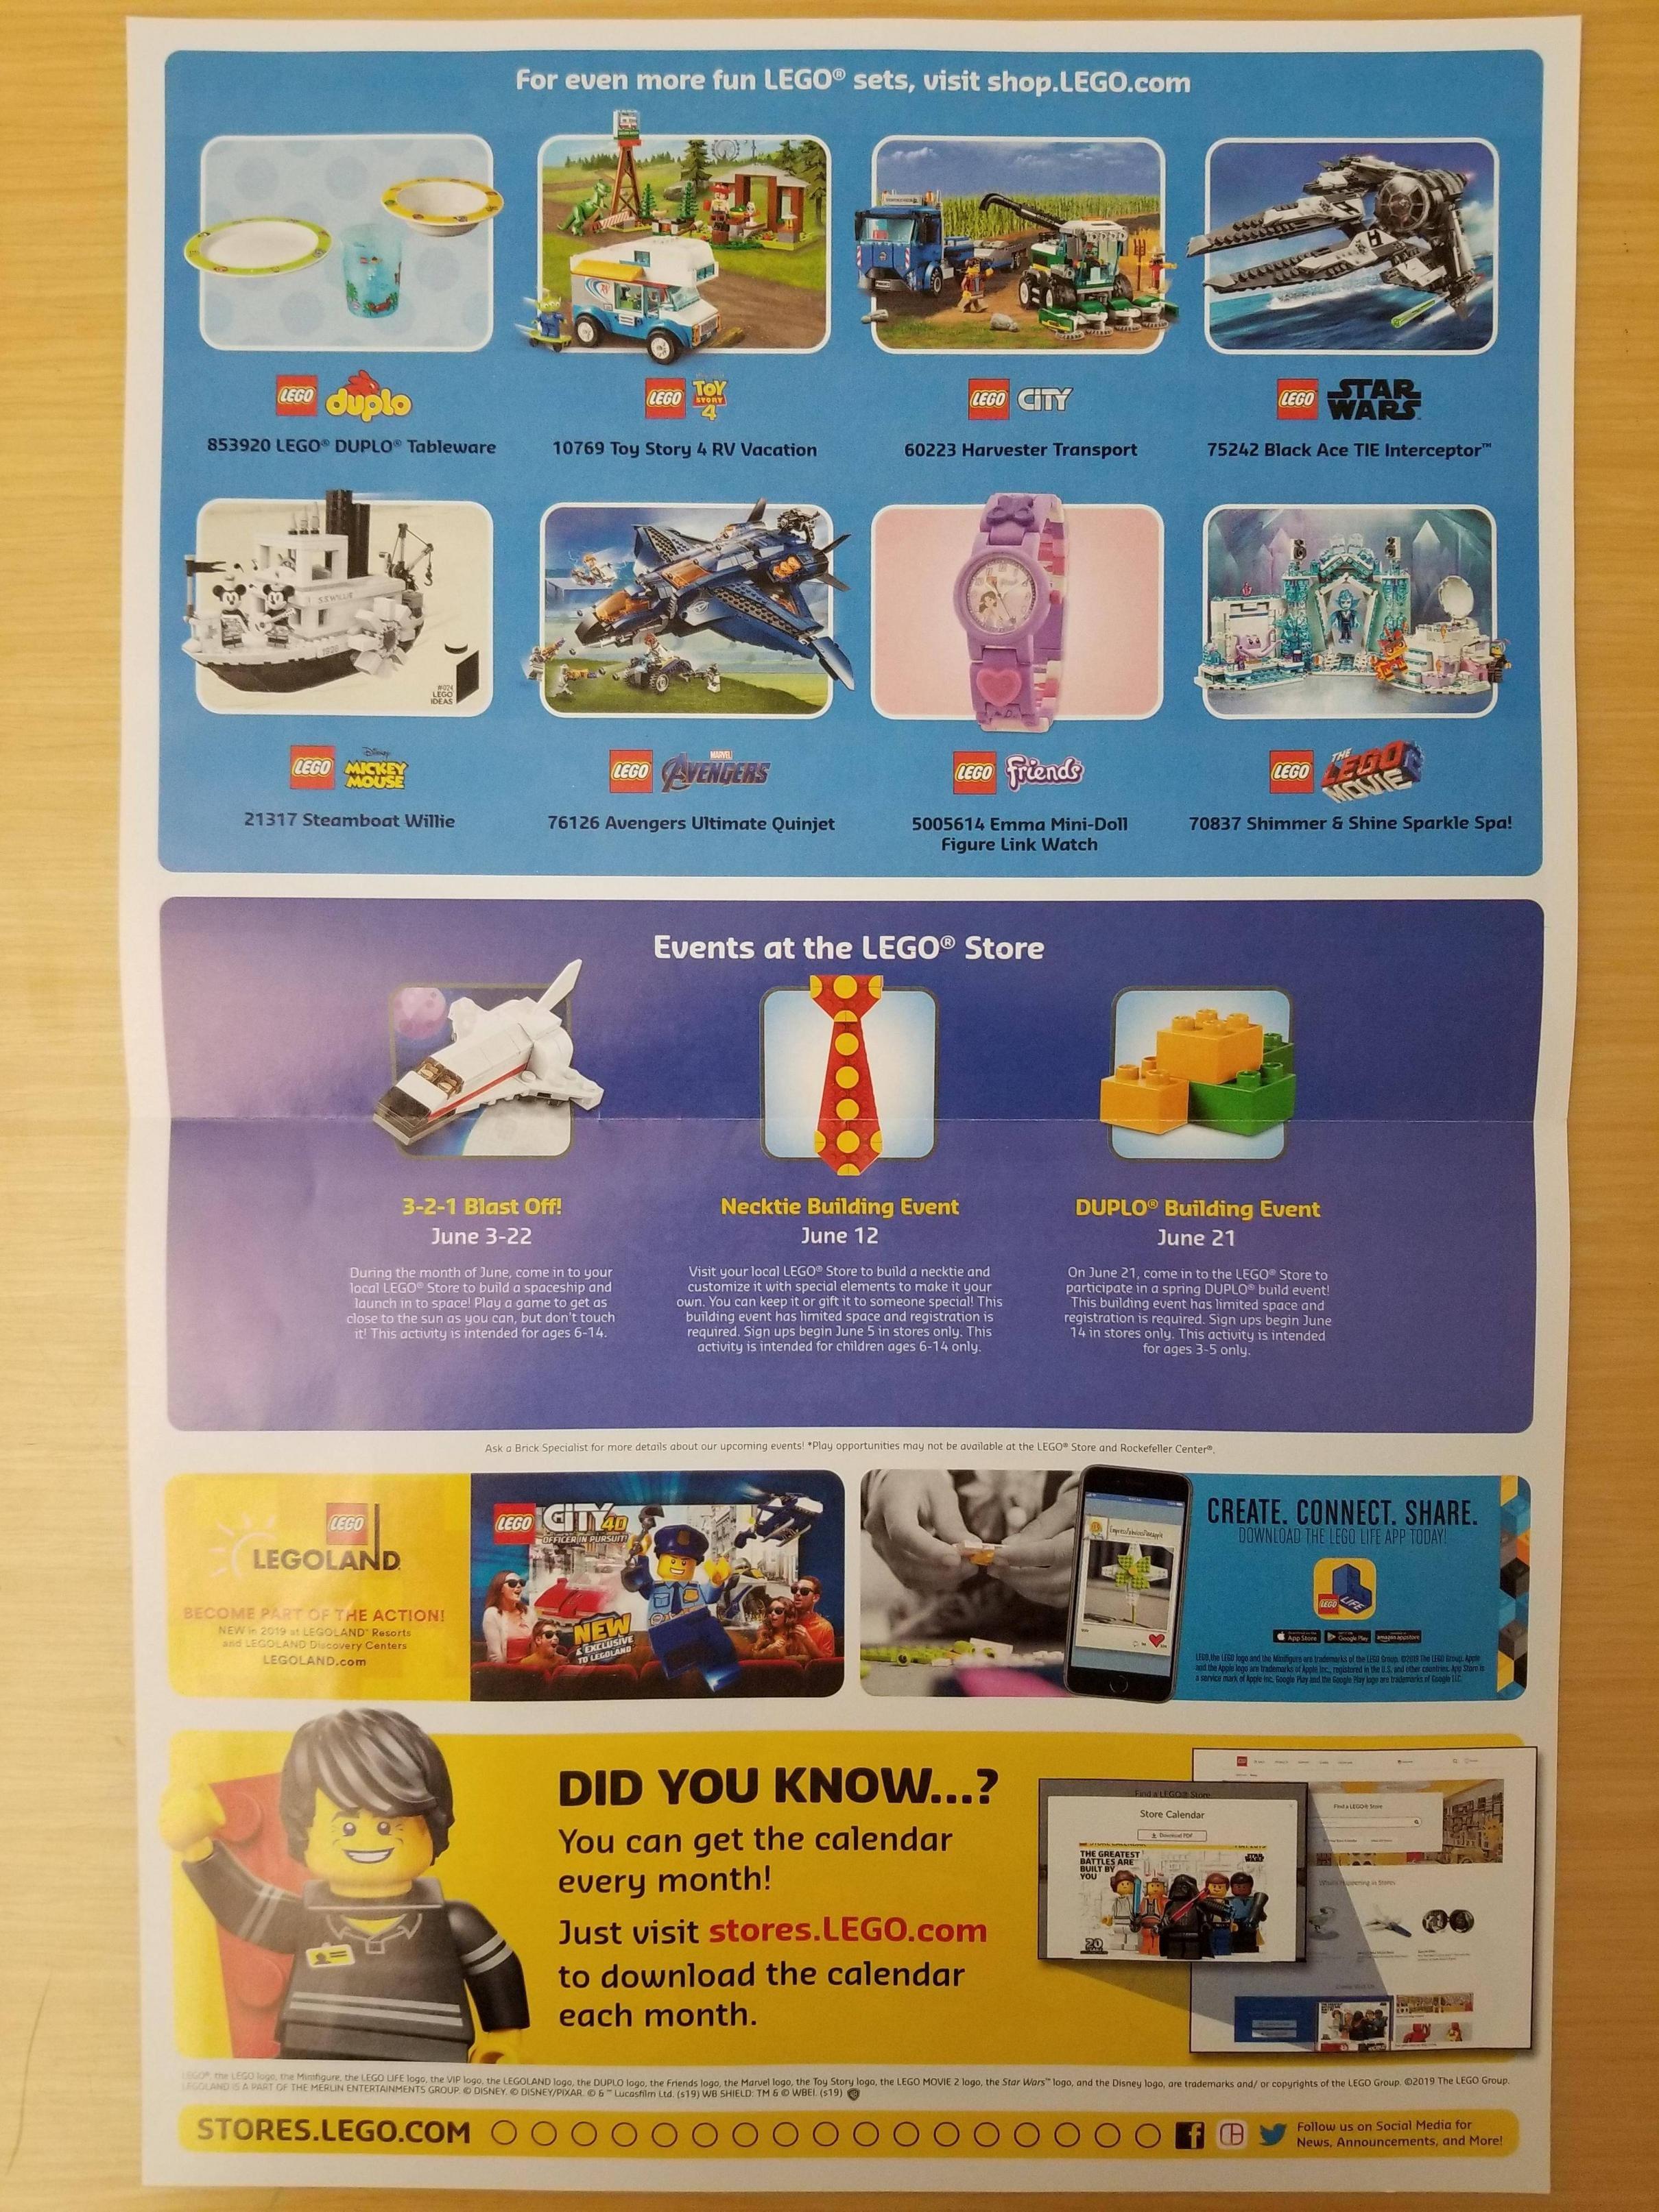 Lego June 2019 Store Calendar Events – The Brick Fan Calendar 2019 In Stores